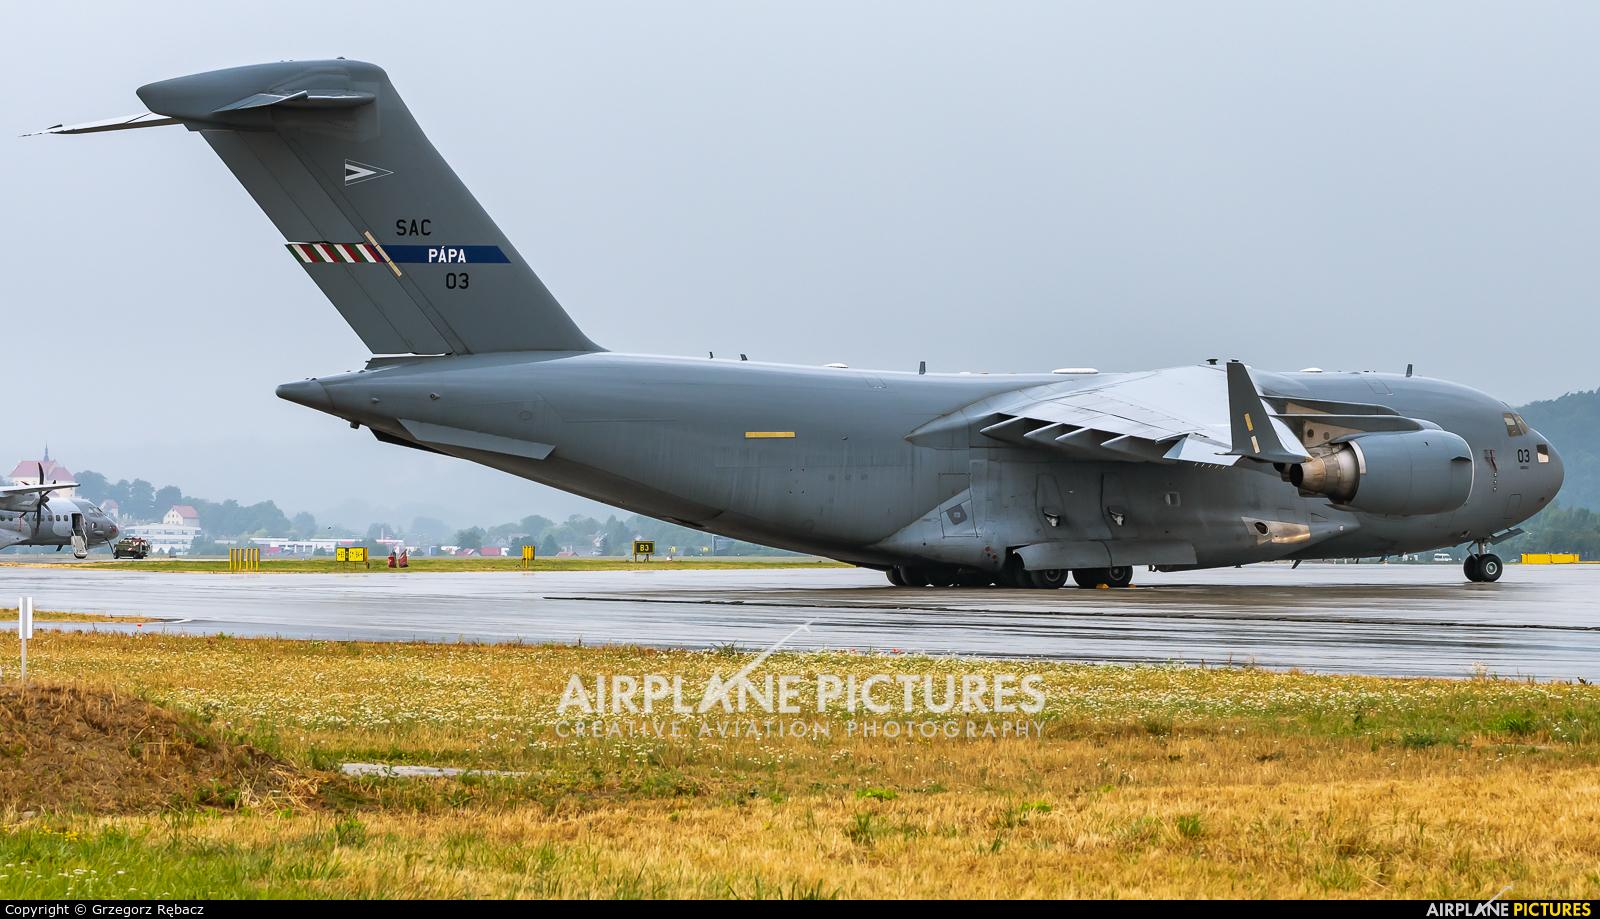 Strategic Airlift Capability NATO 08-0003 aircraft at Kraków - John Paul II Intl